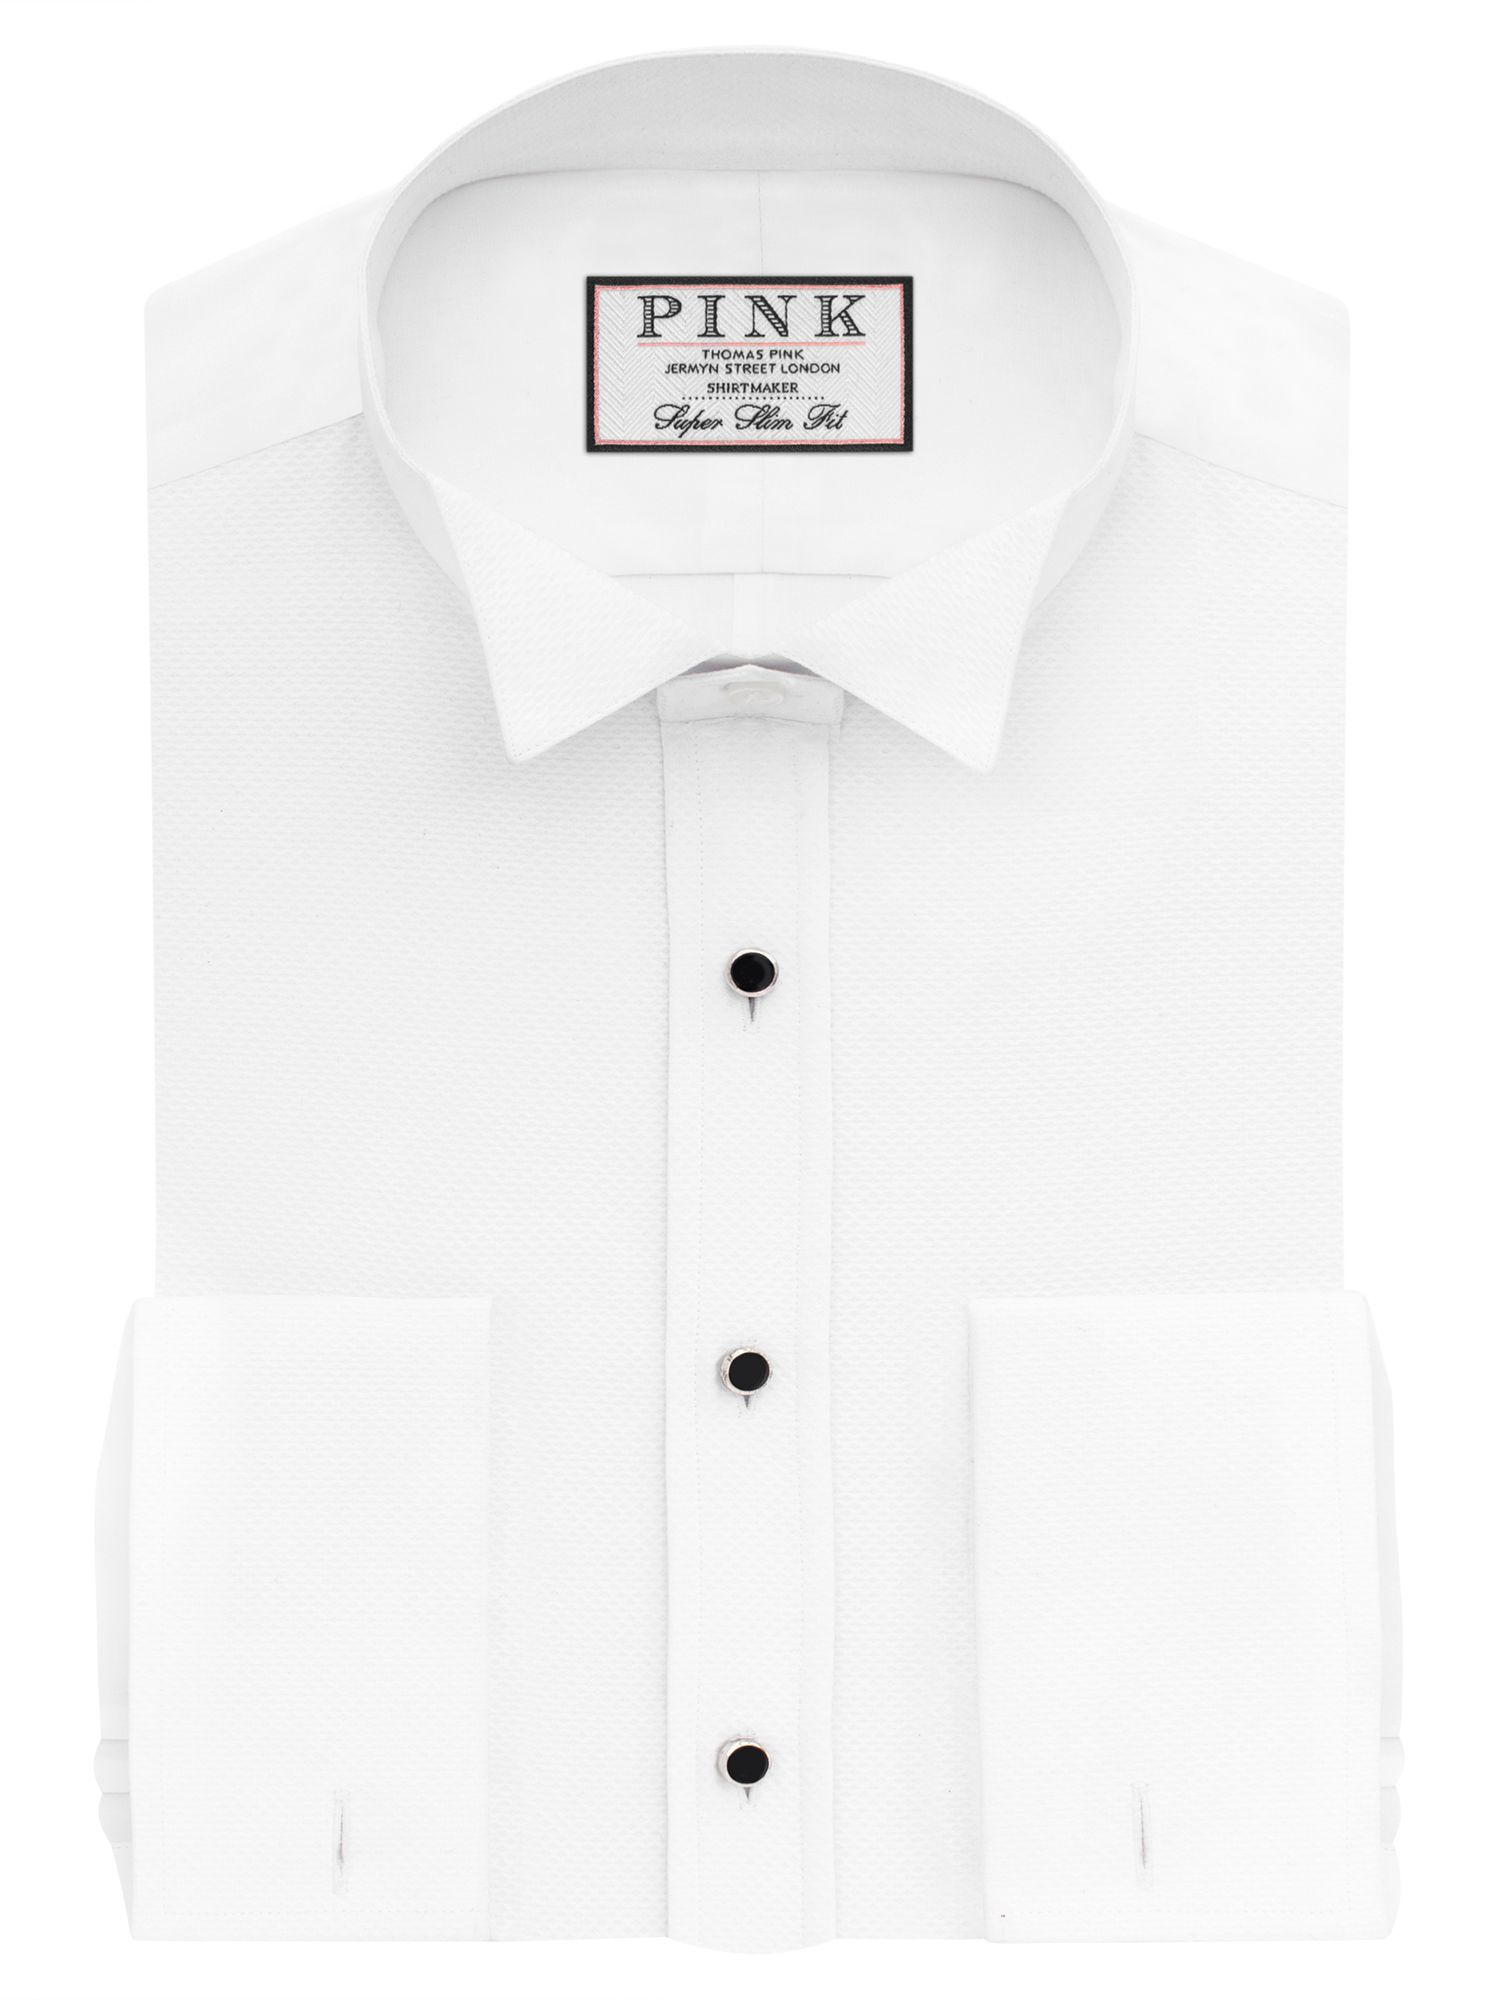 Thomas Pink Marcella Wing Collar Super Slim Fit Dress